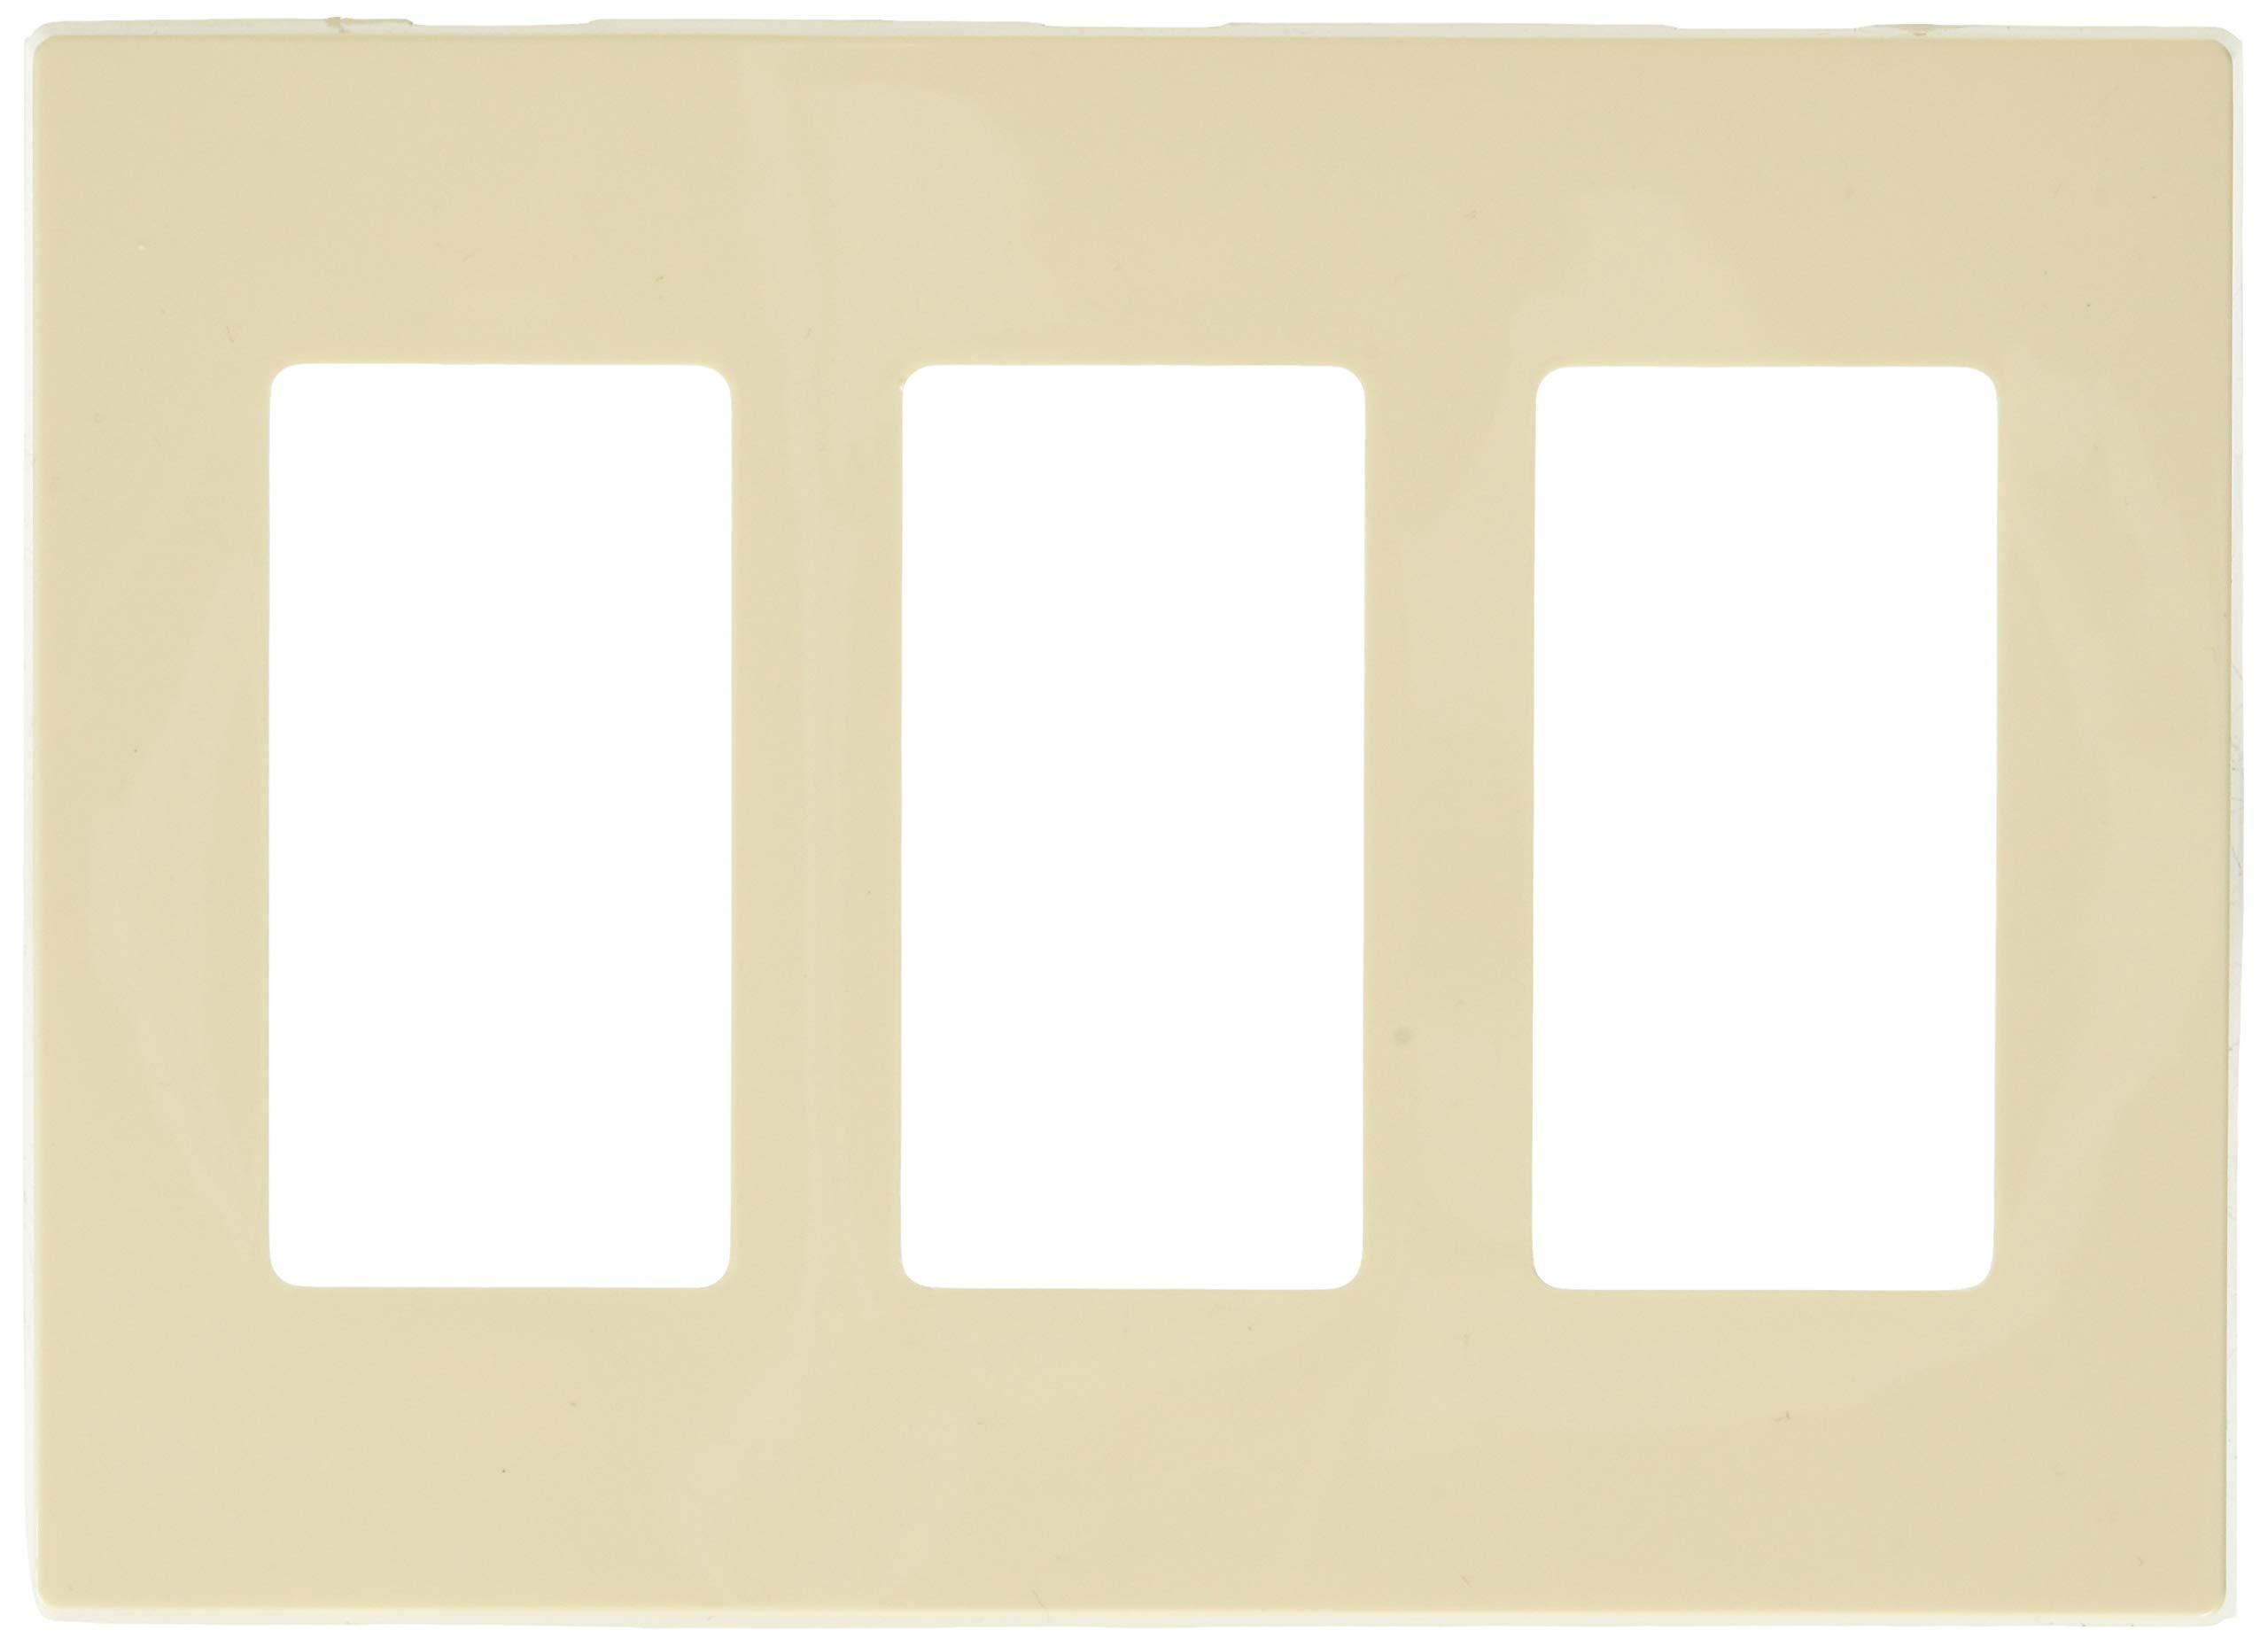 Leviton 80311-ST 3-Gang Decora Plus Screwless Snap-On Wallplate, Light Almond, 10-Pack